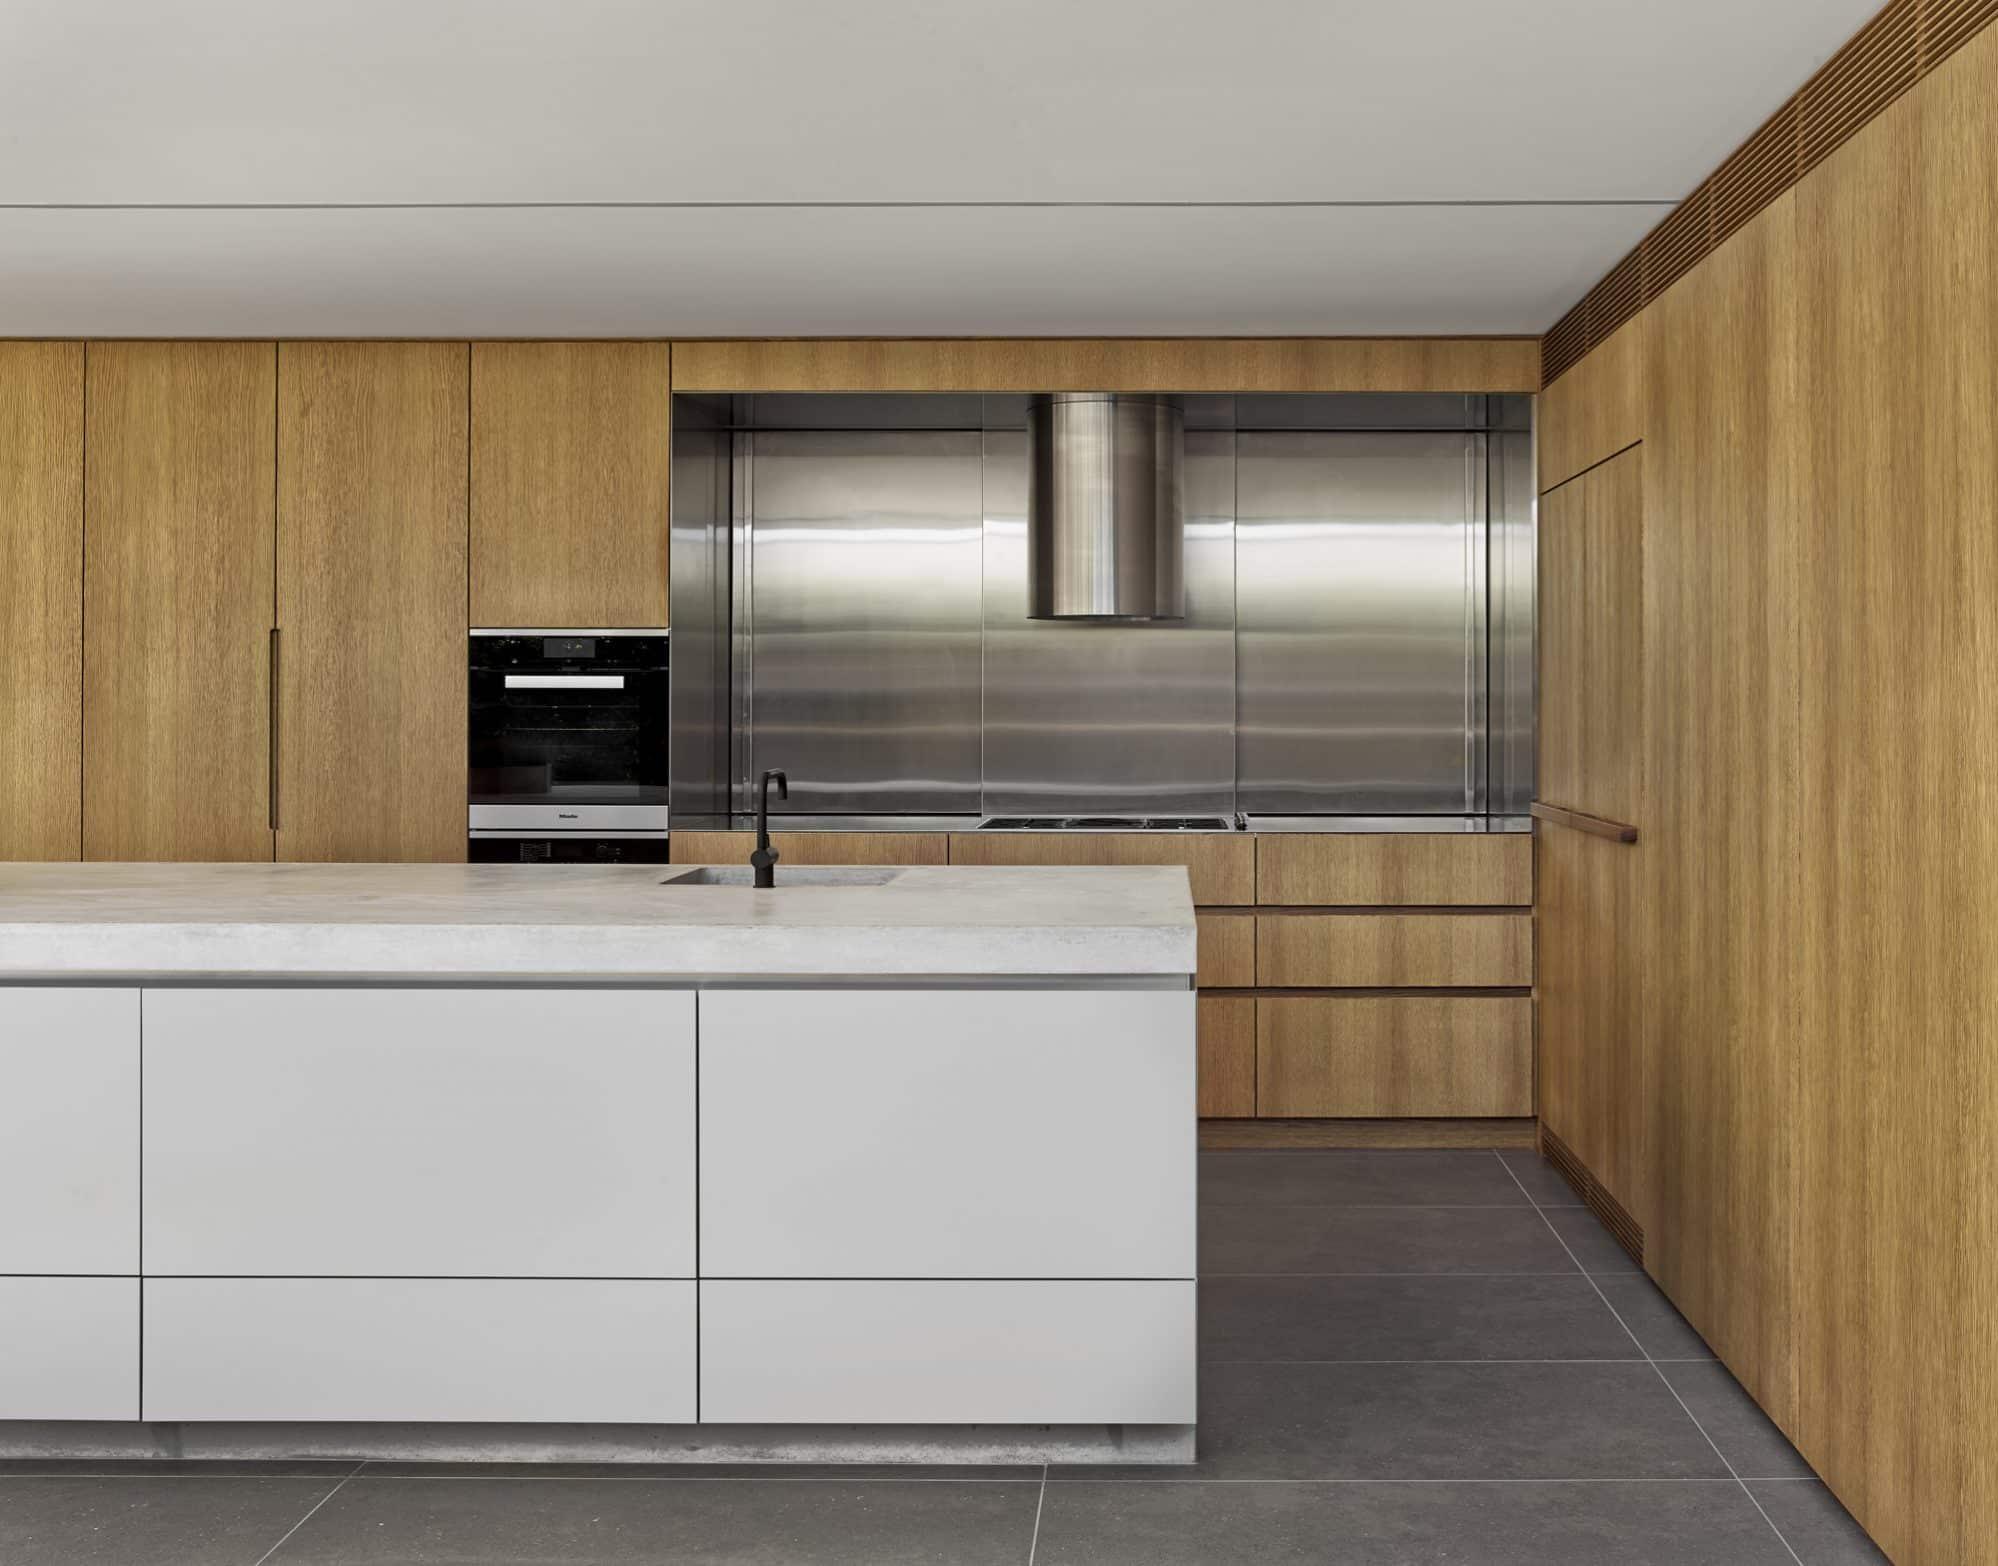 Stainless steel cooking niche with hidden storage